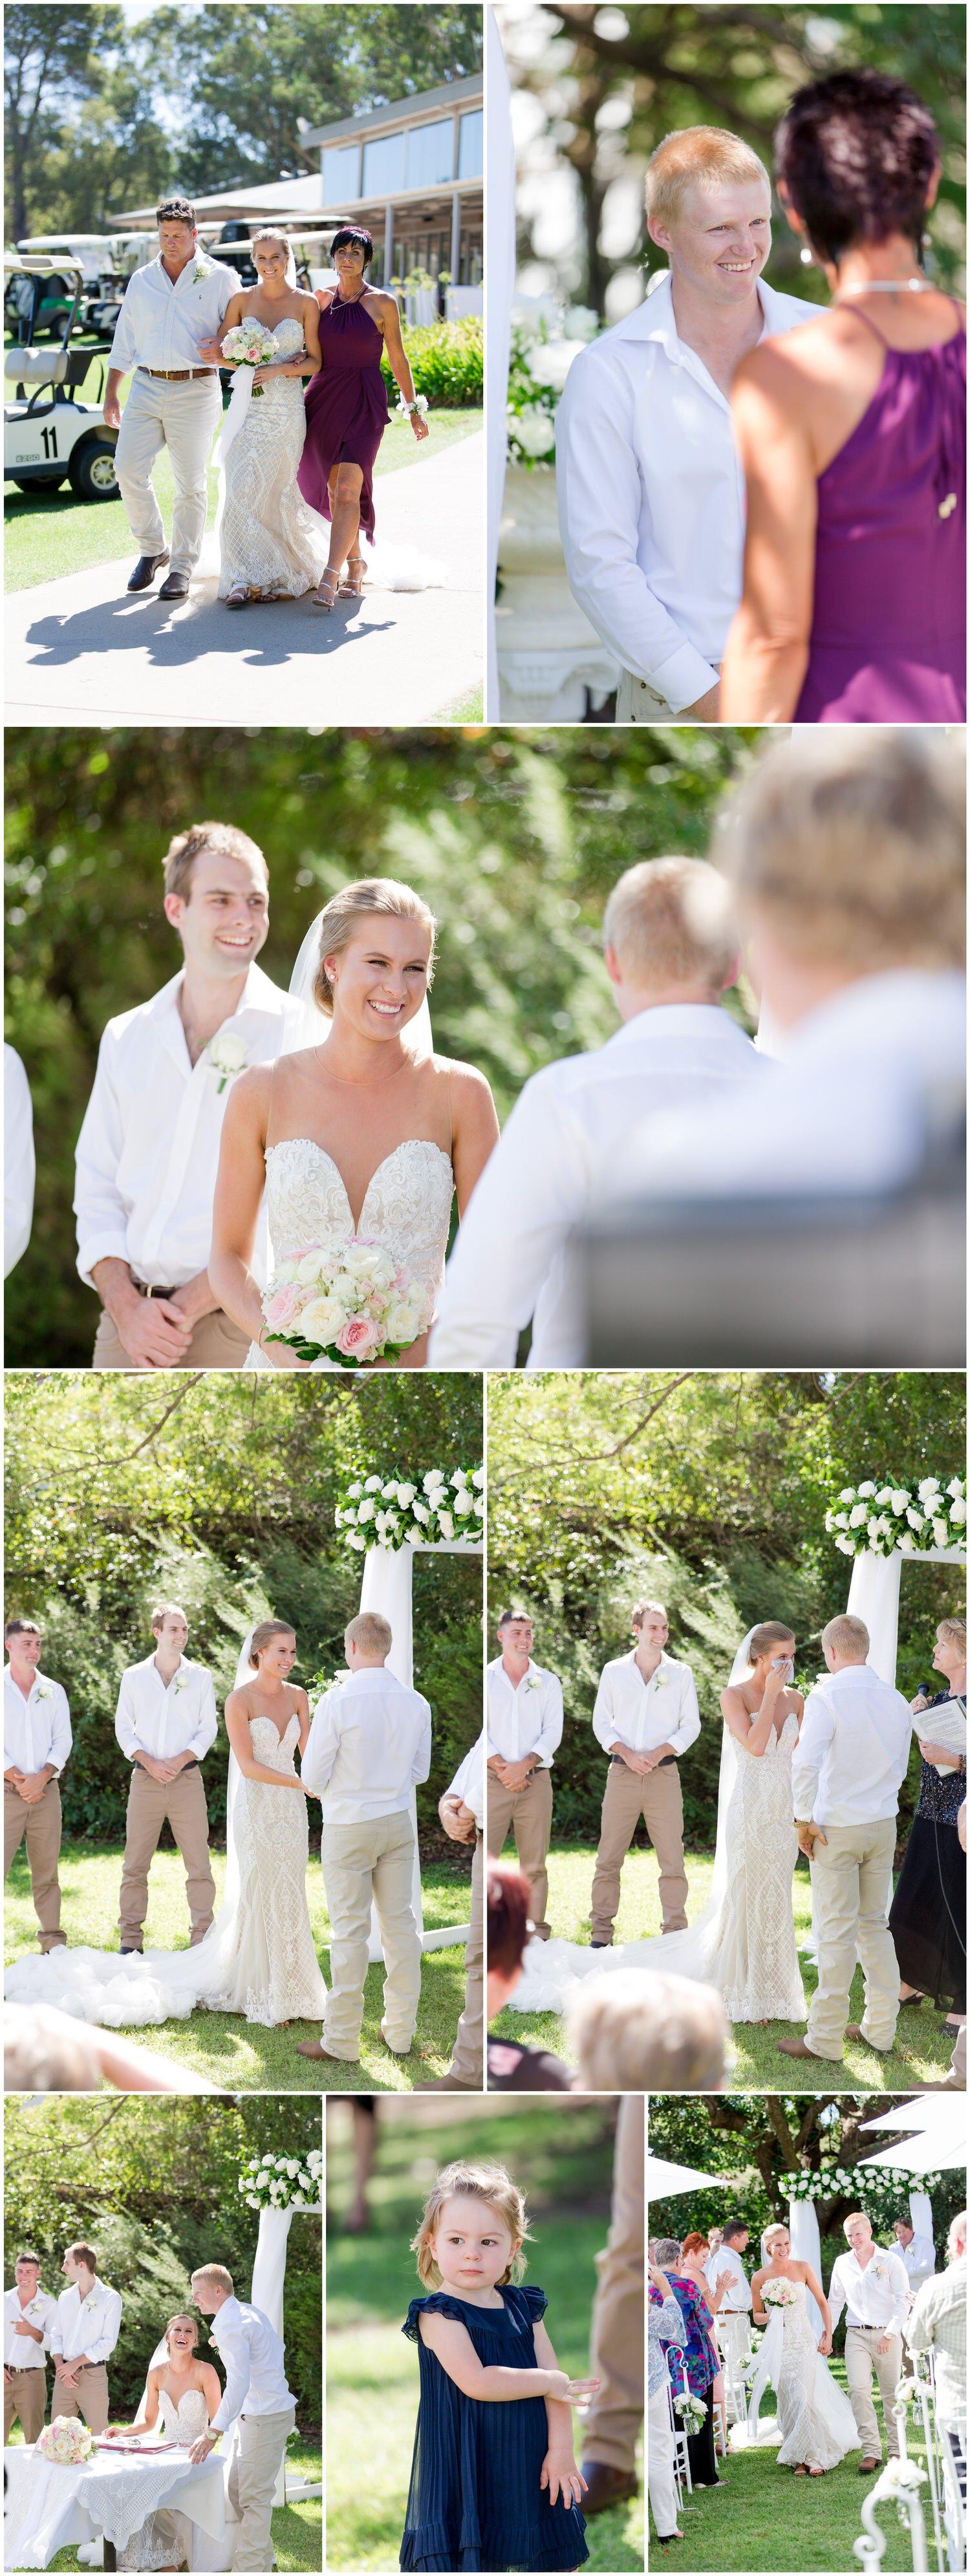 Dubbo Wedding Photography - Dubbo Golf Club Wedding 7